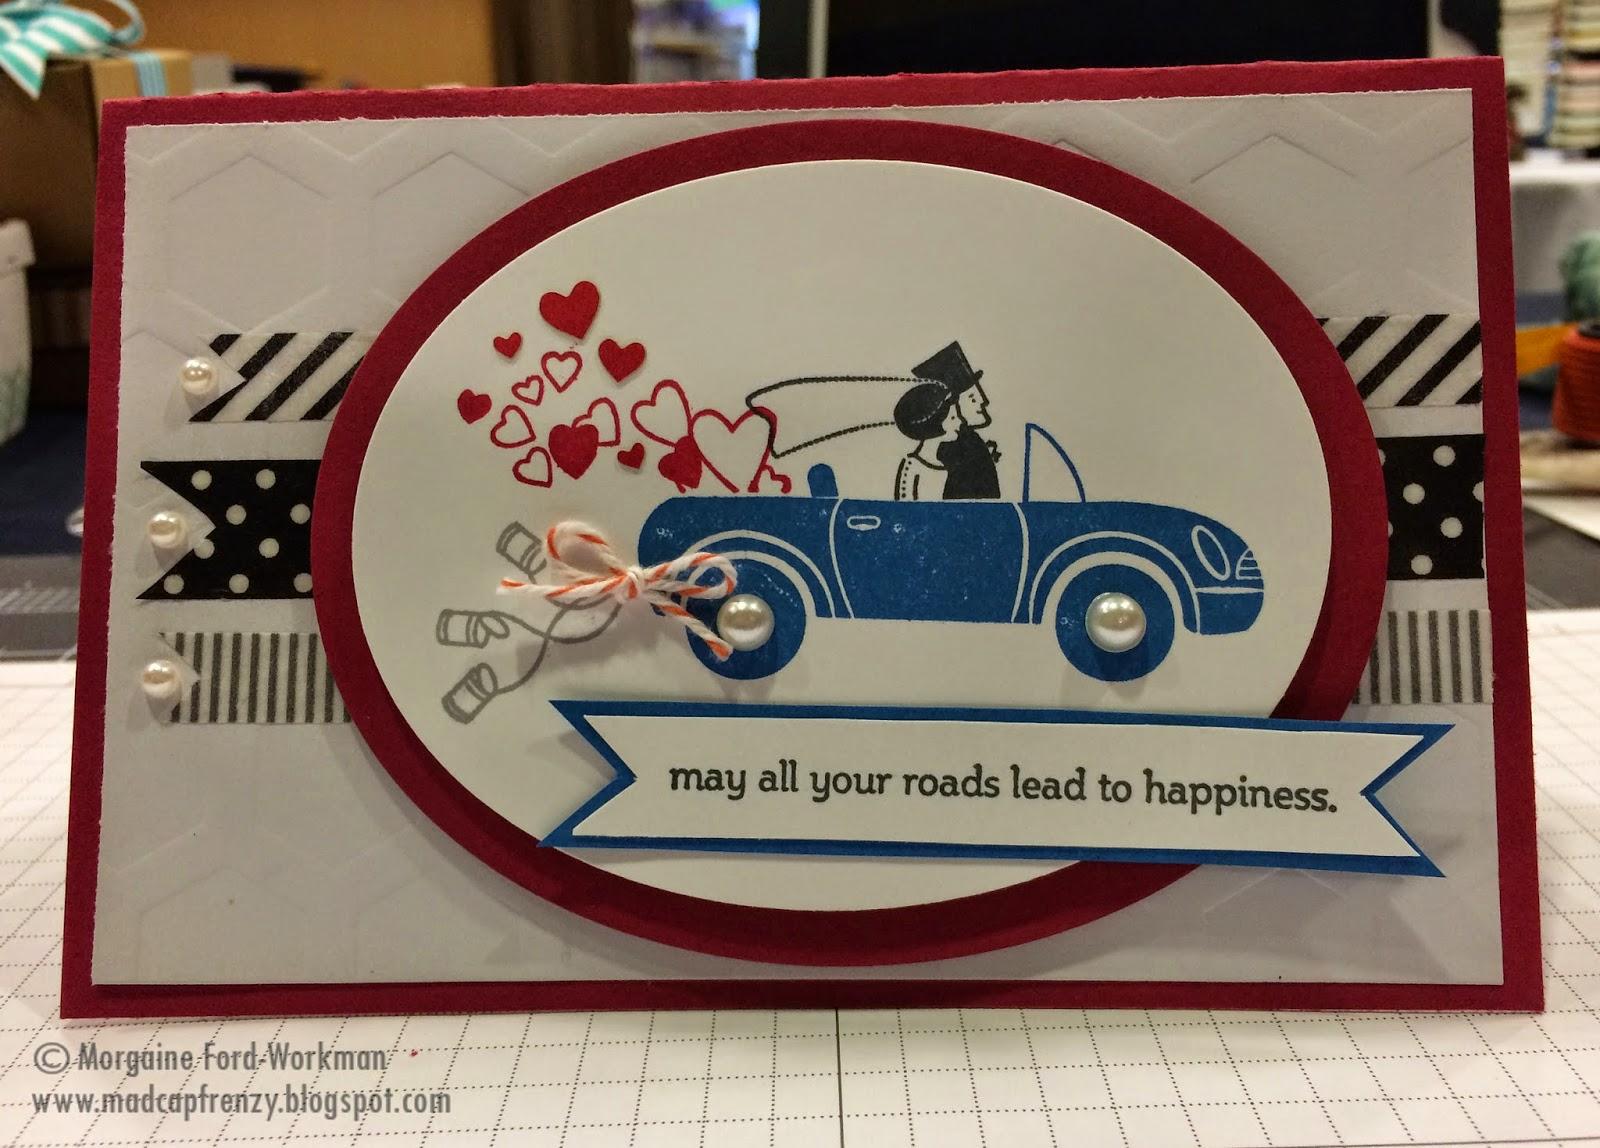 Madcap Frenzy's wedding card